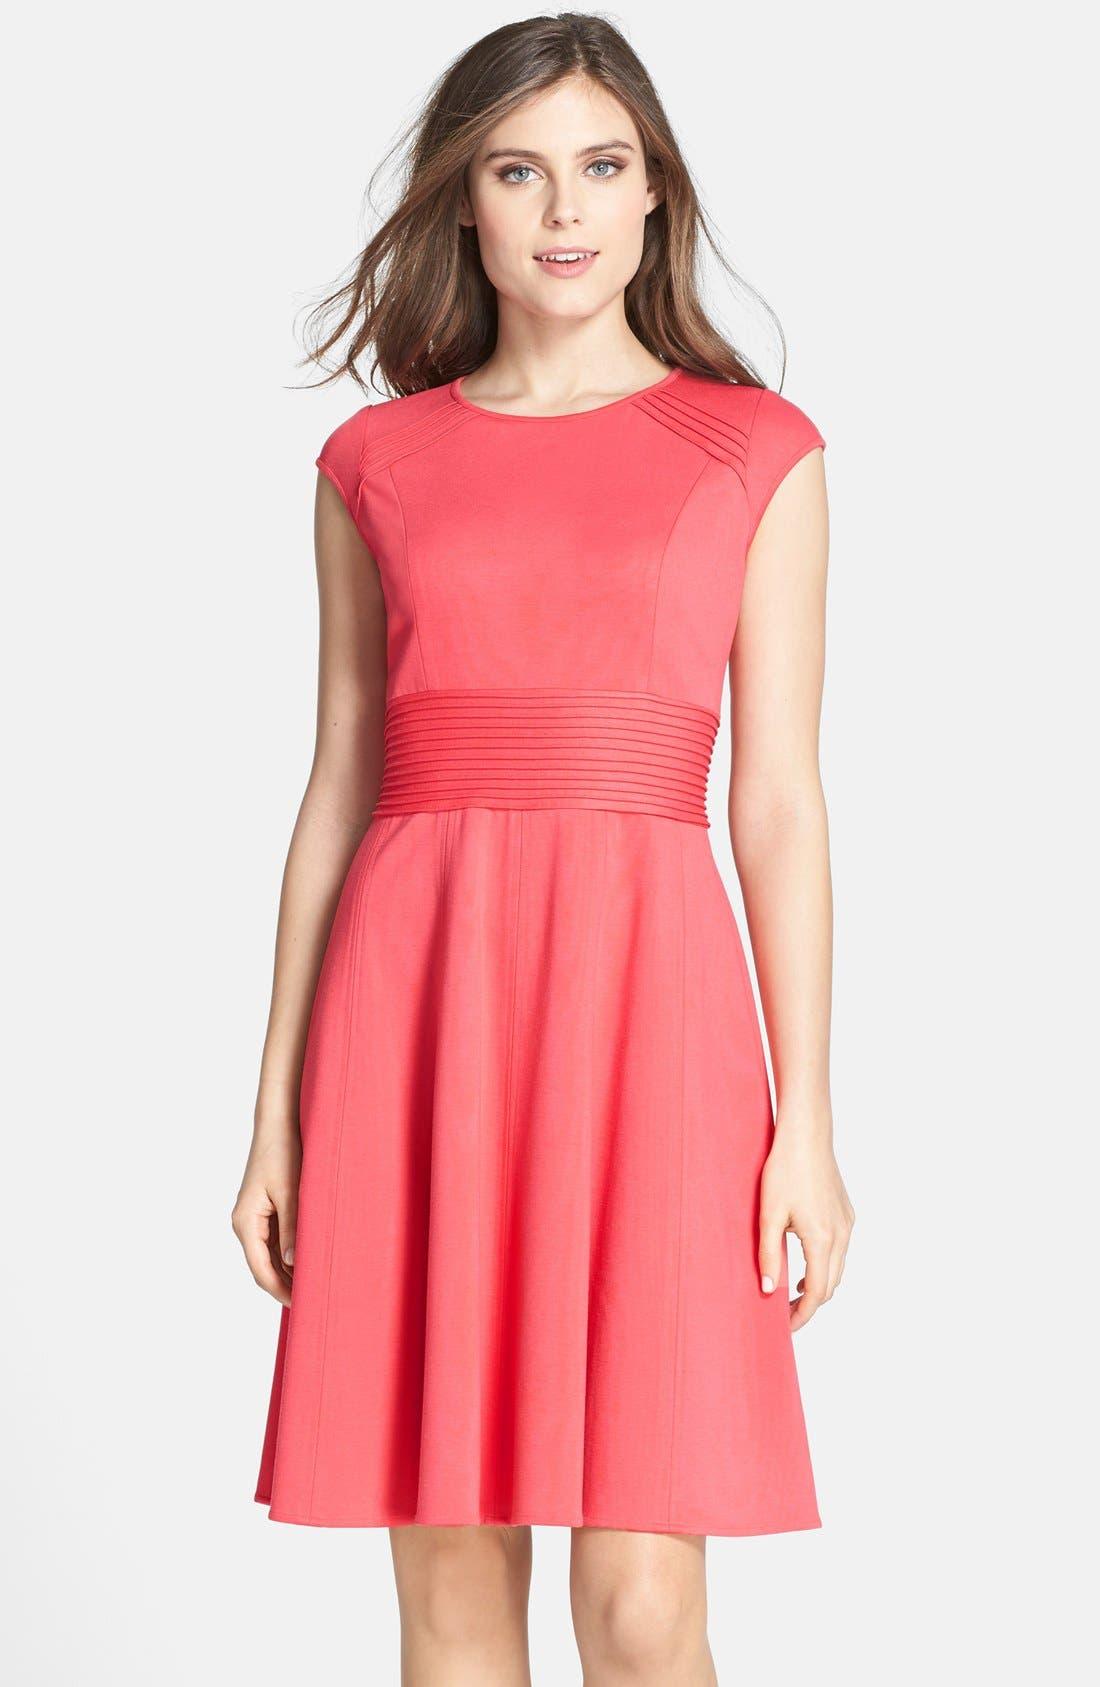 Main Image - Eliza J Pintucked Waist Seamed Ponte Knit Fit & Flare Dress